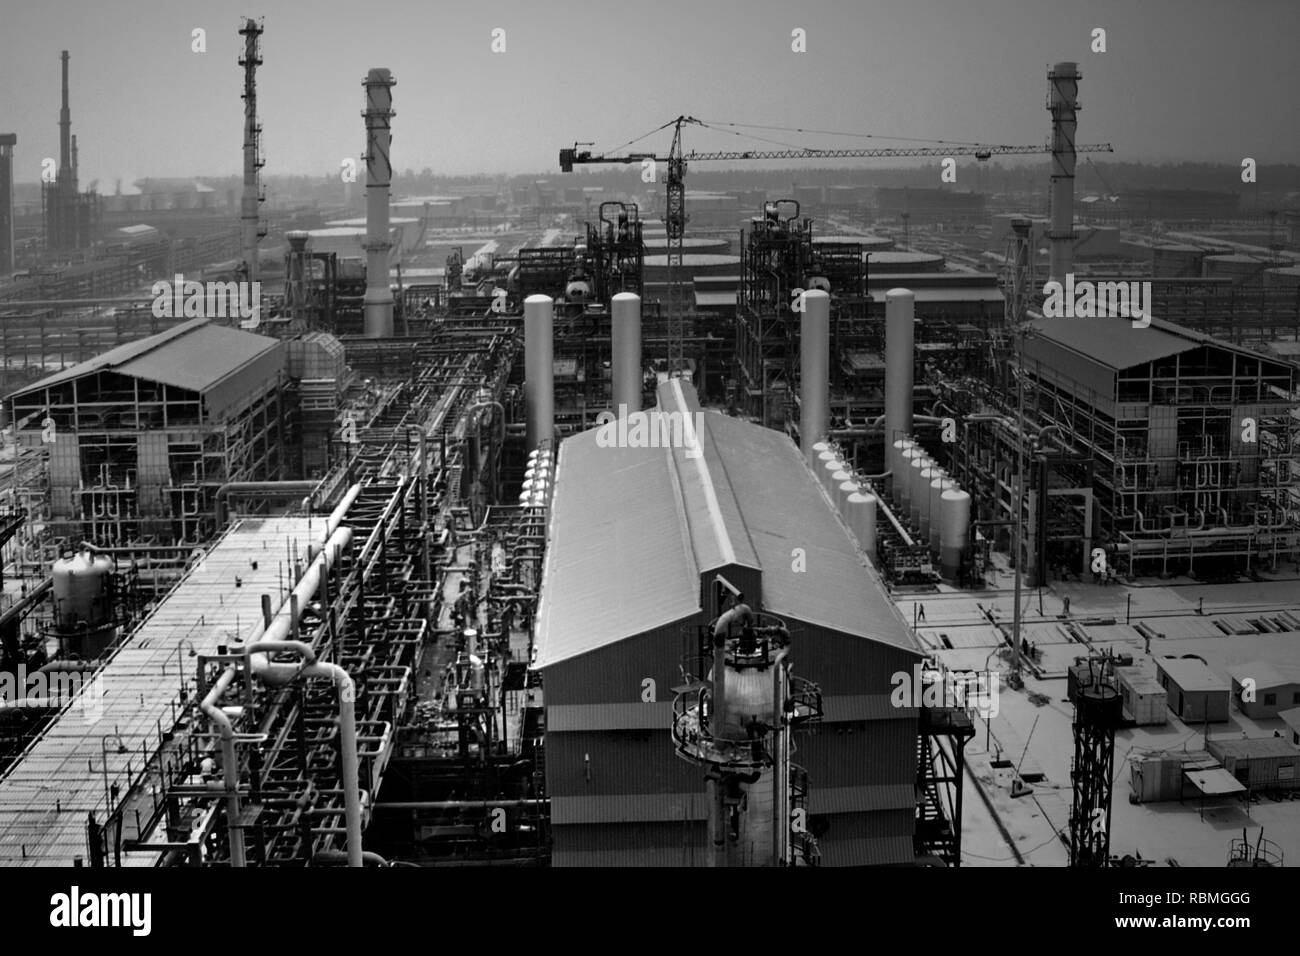 Indian Oil Corporation Limited, Panipat, Haryana, India, Asia - Stock Image